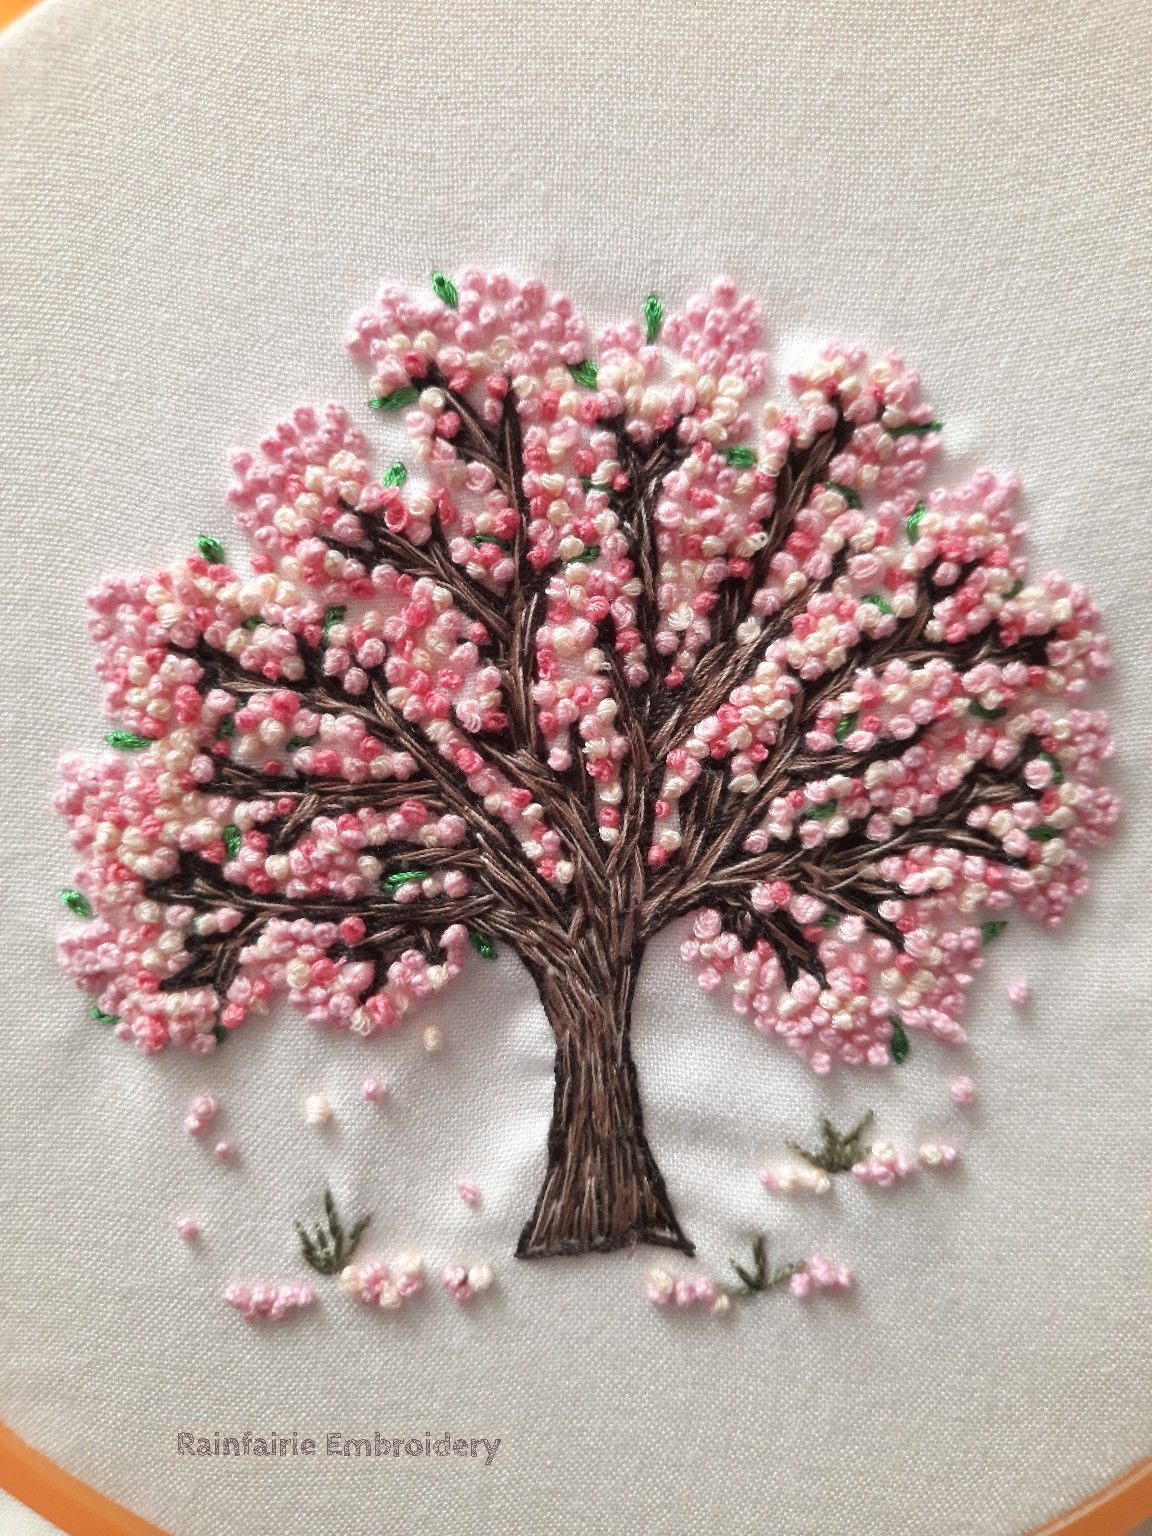 Sakura Cherry Blossoms Flower Embroidery Designs Diy Embroidery Designs Embroidery Flowers Pattern